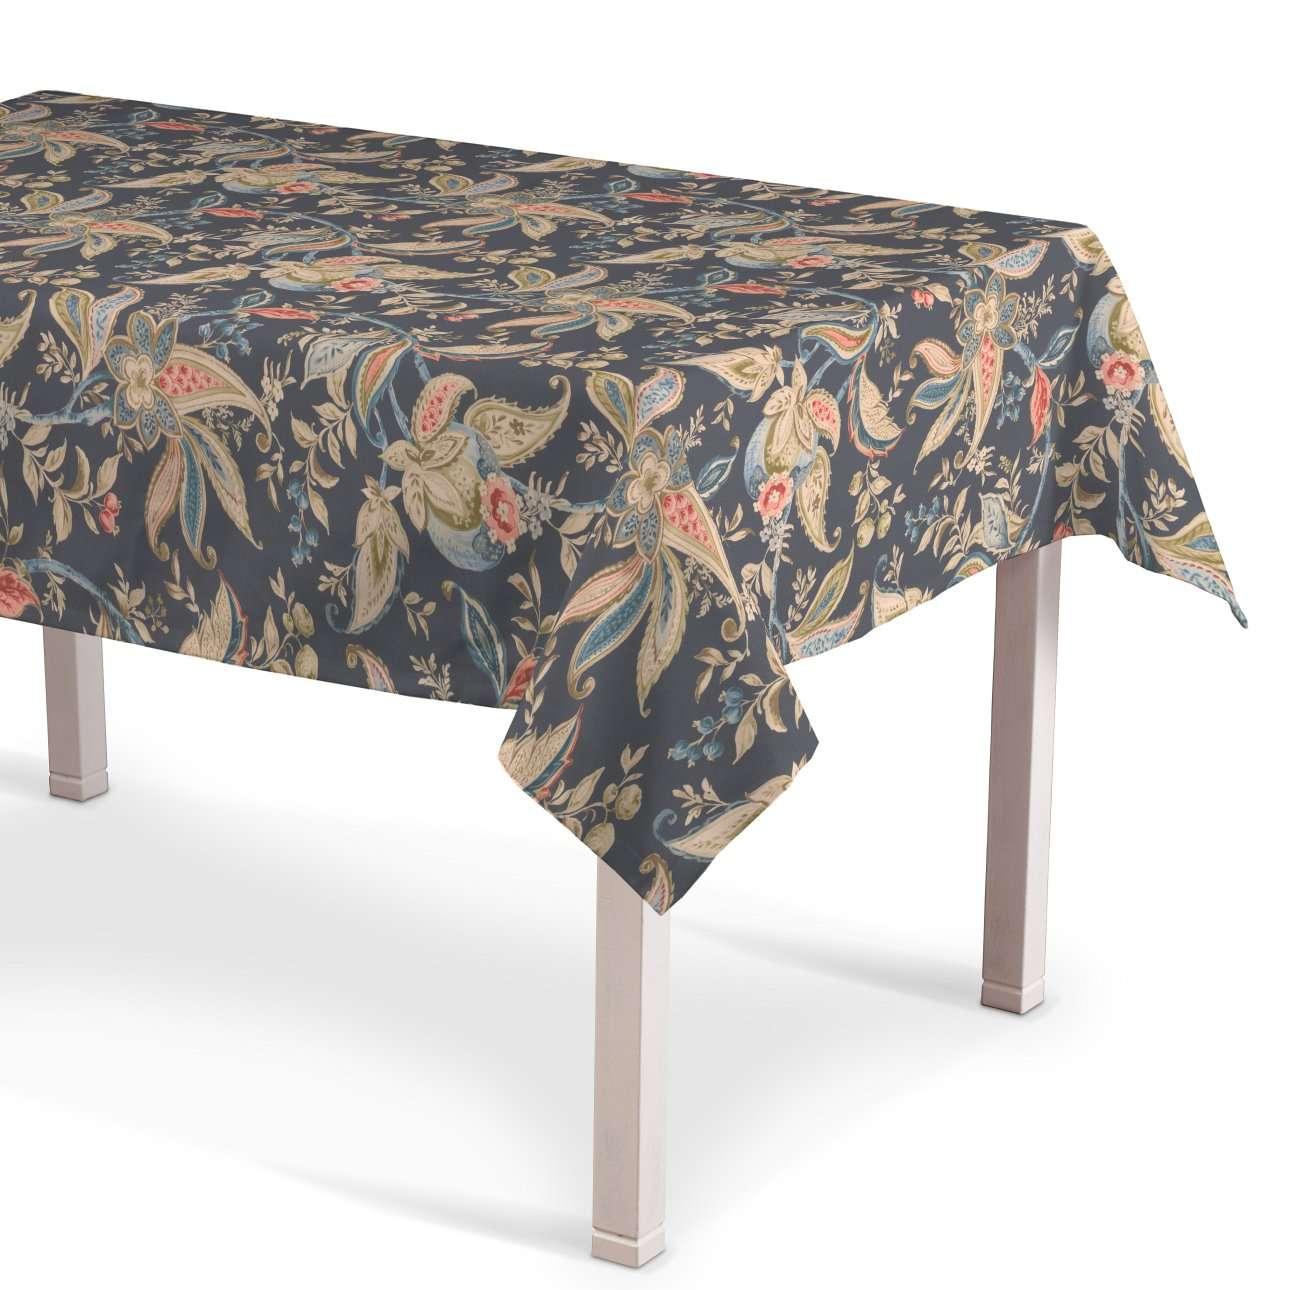 Rectangular tablecloth in collection Gardenia, fabric: 142-19